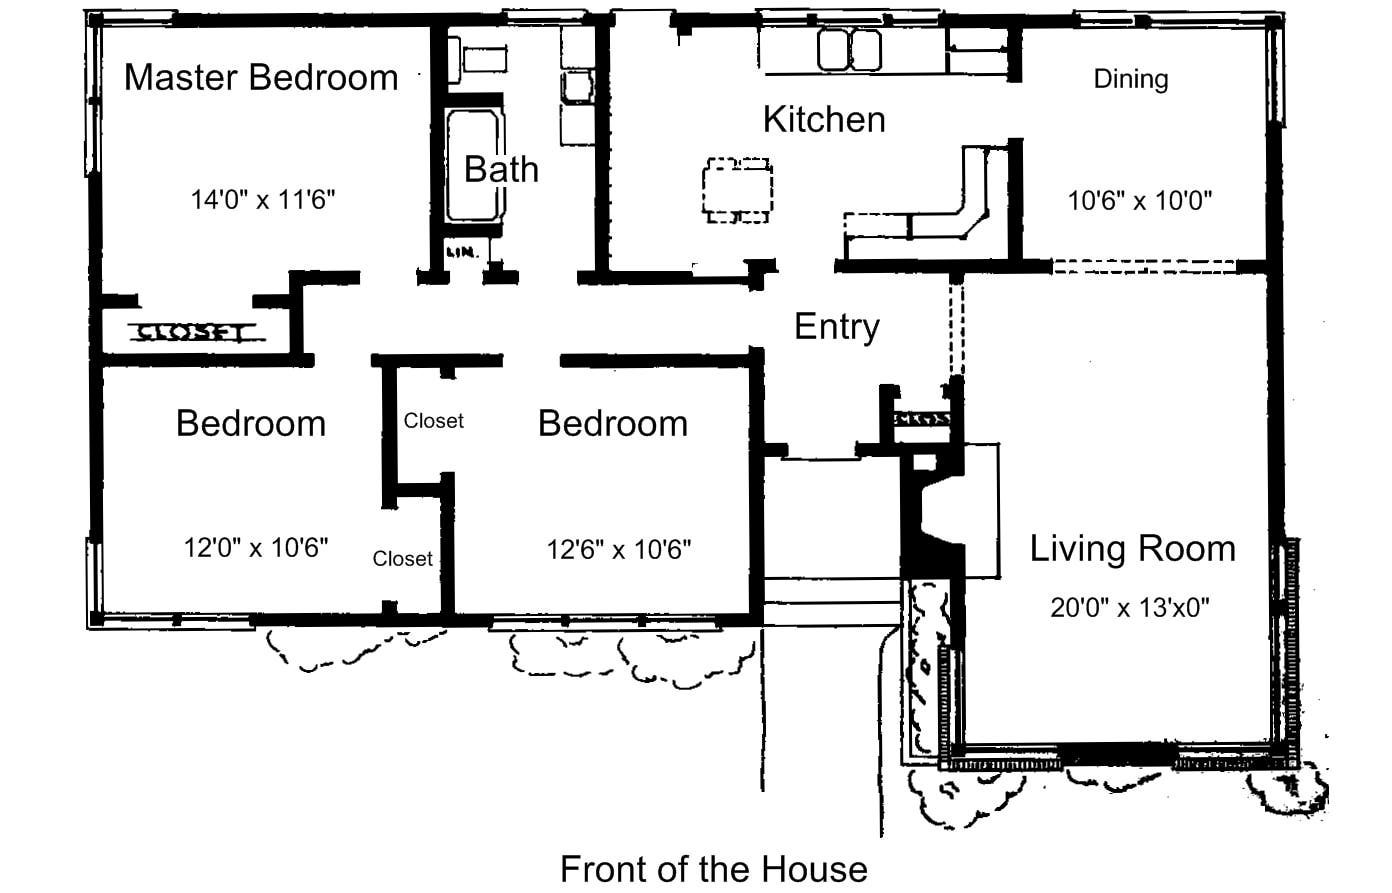 Amazing 3 Bedroom Apartmenthouse Plans Cheap 3 Bedroom House Plans 3 Largest Home Design Picture Inspirations Pitcheantrous